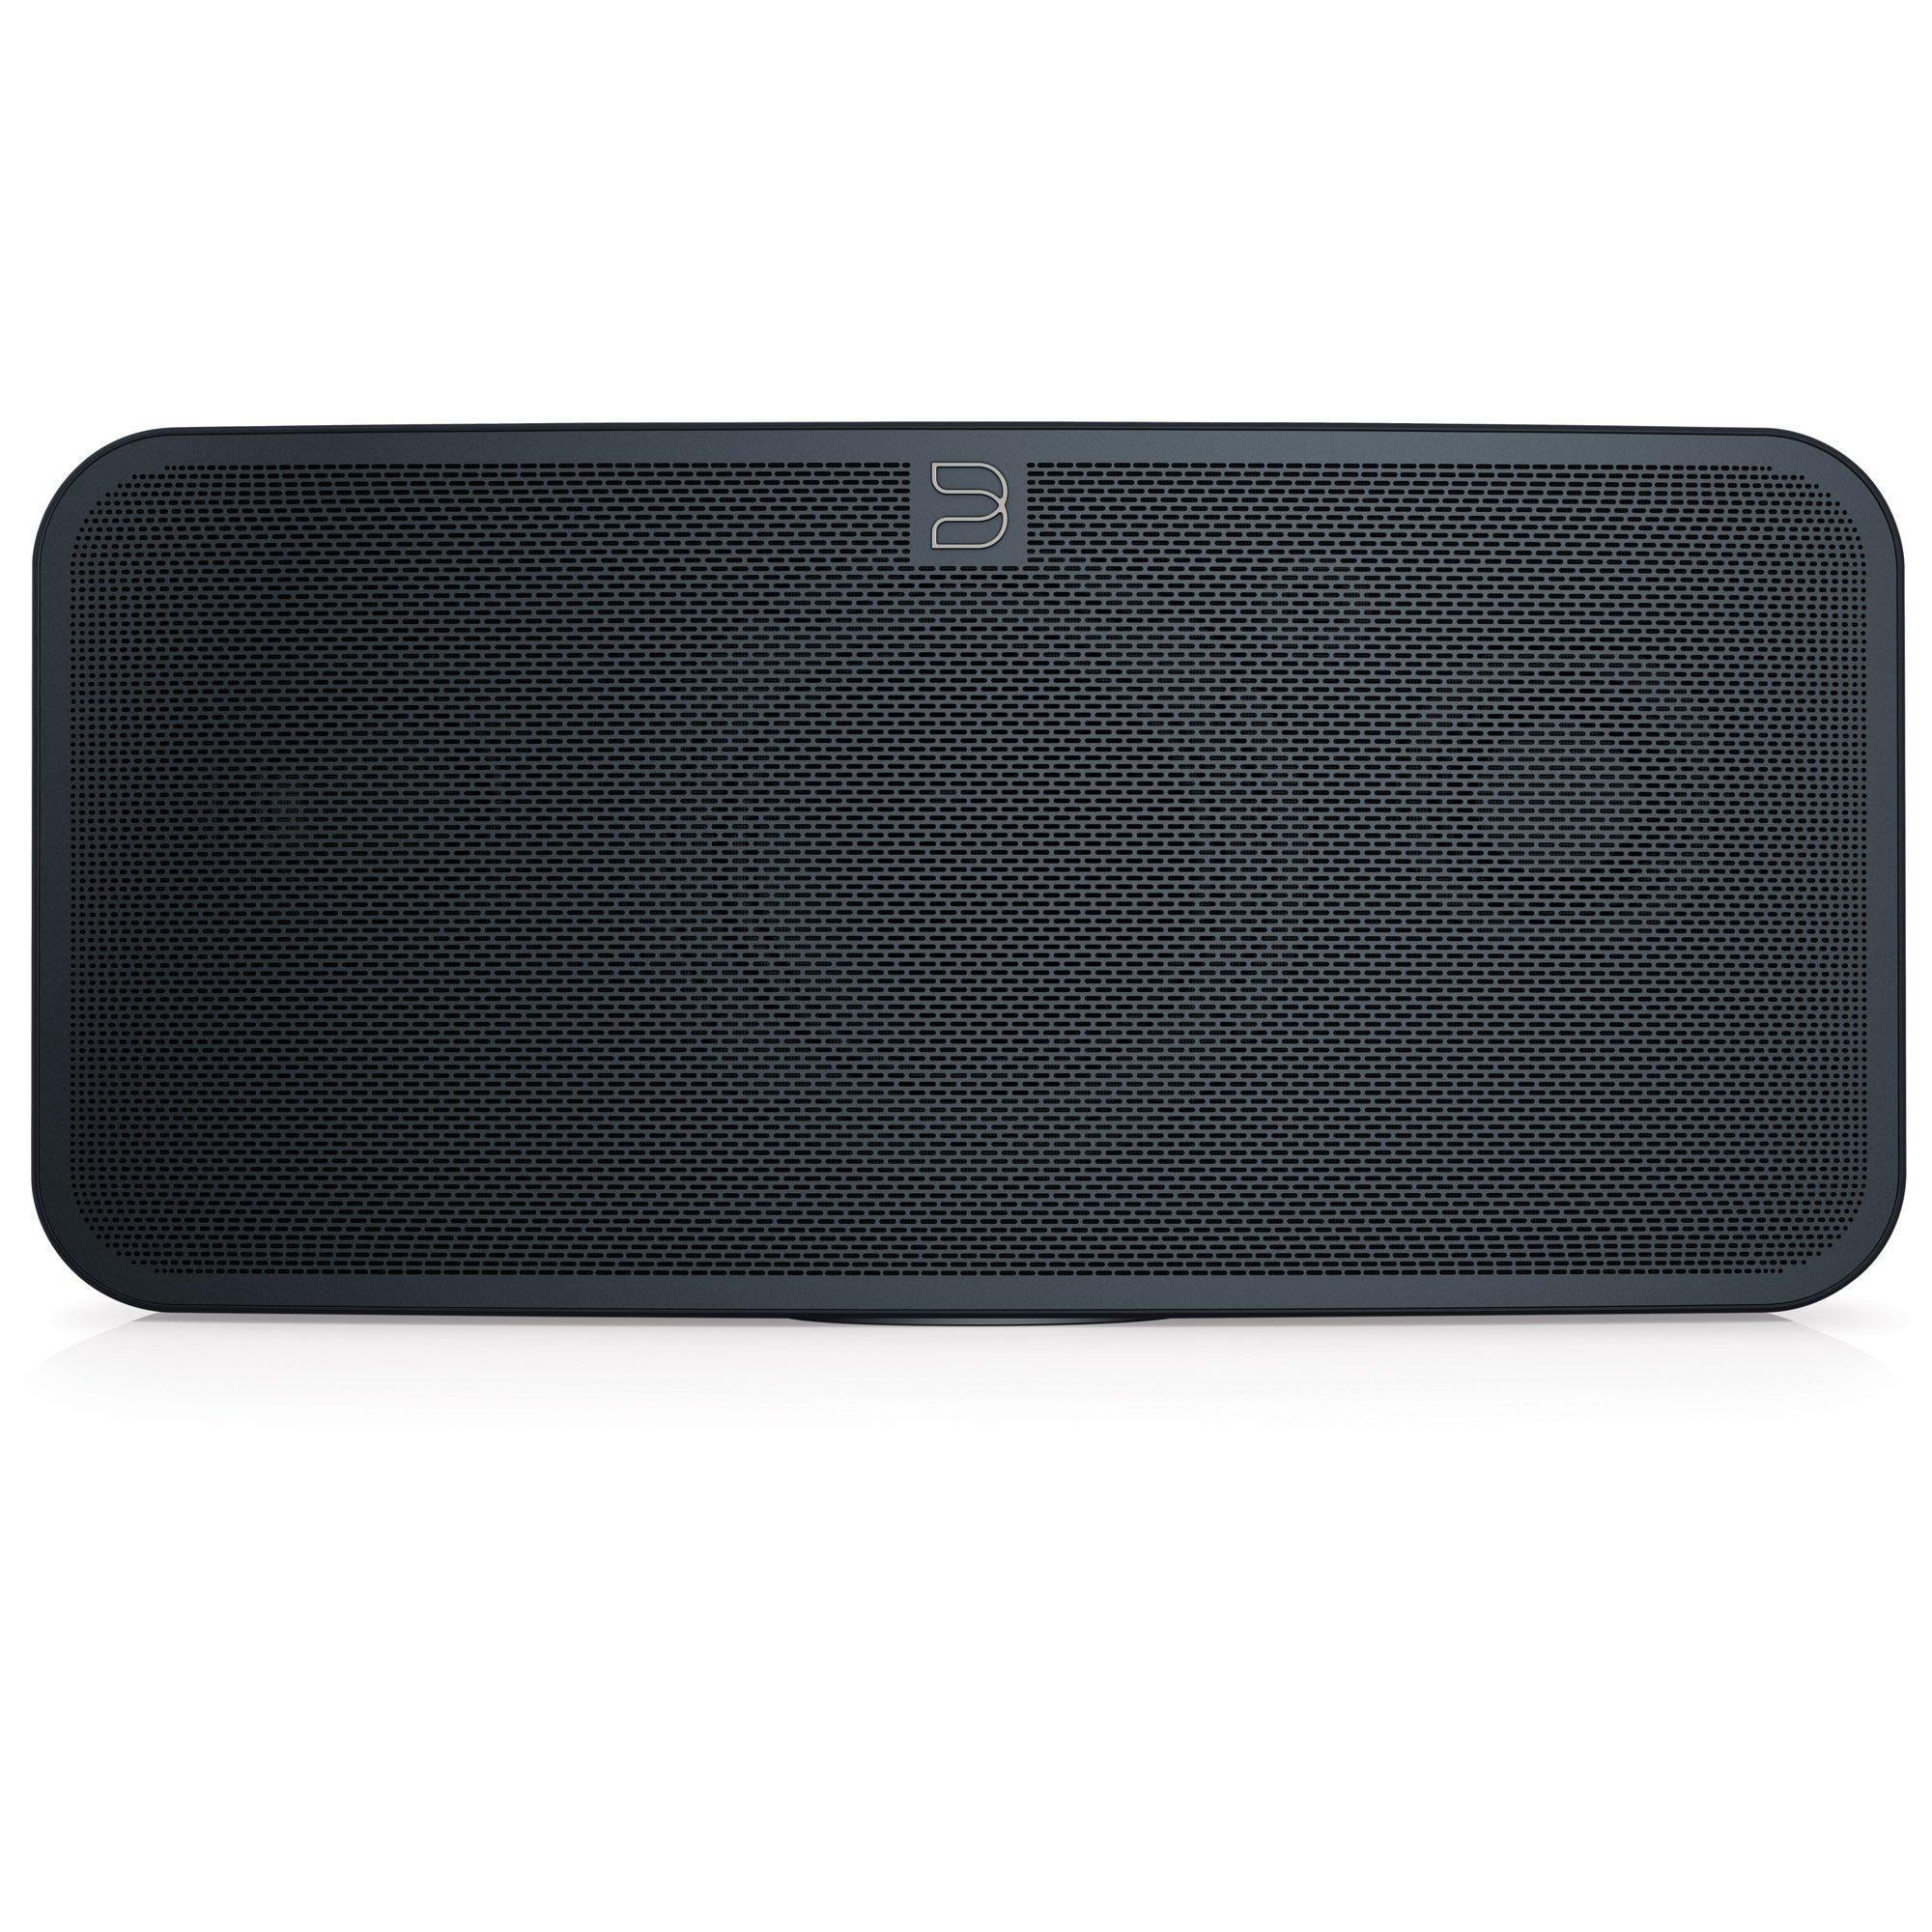 Bluesound PULSE 2 Wireless Multi-room Smart Speaker with Bluetooth - Black